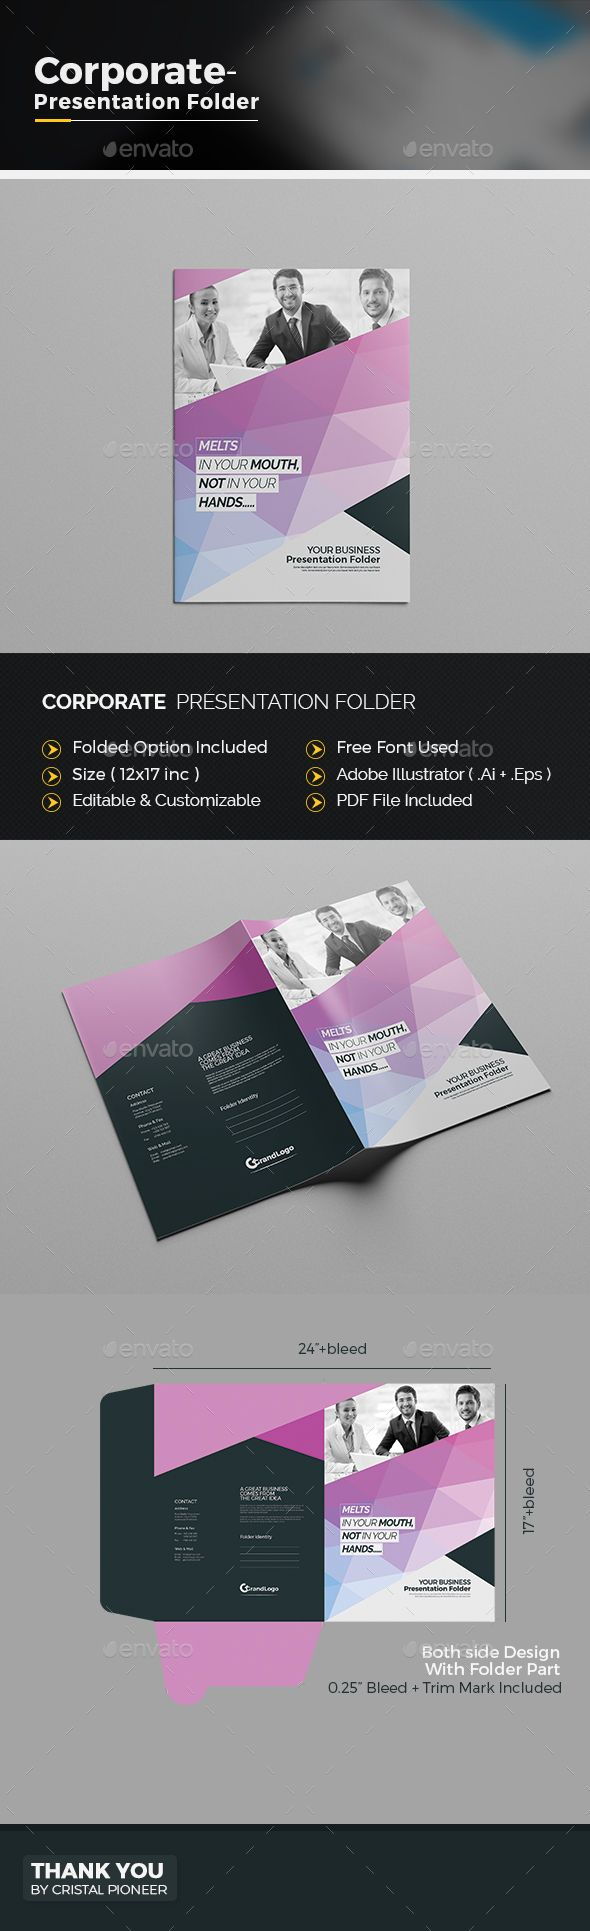 Corporate Presentation Folder | Pinterest